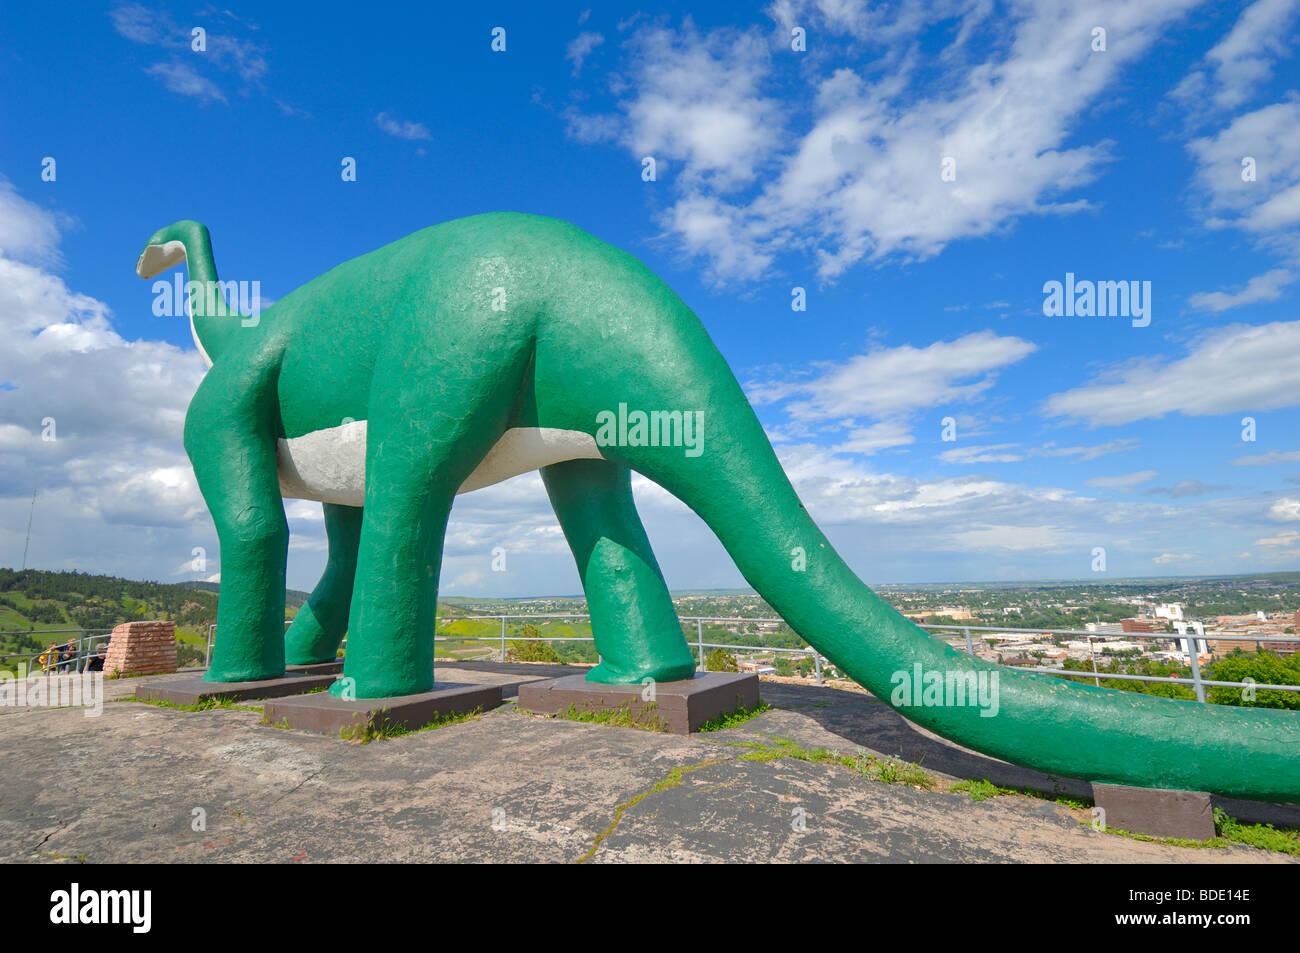 Dinosaur City Stock Photos & Dinosaur City Stock Images - Alamy